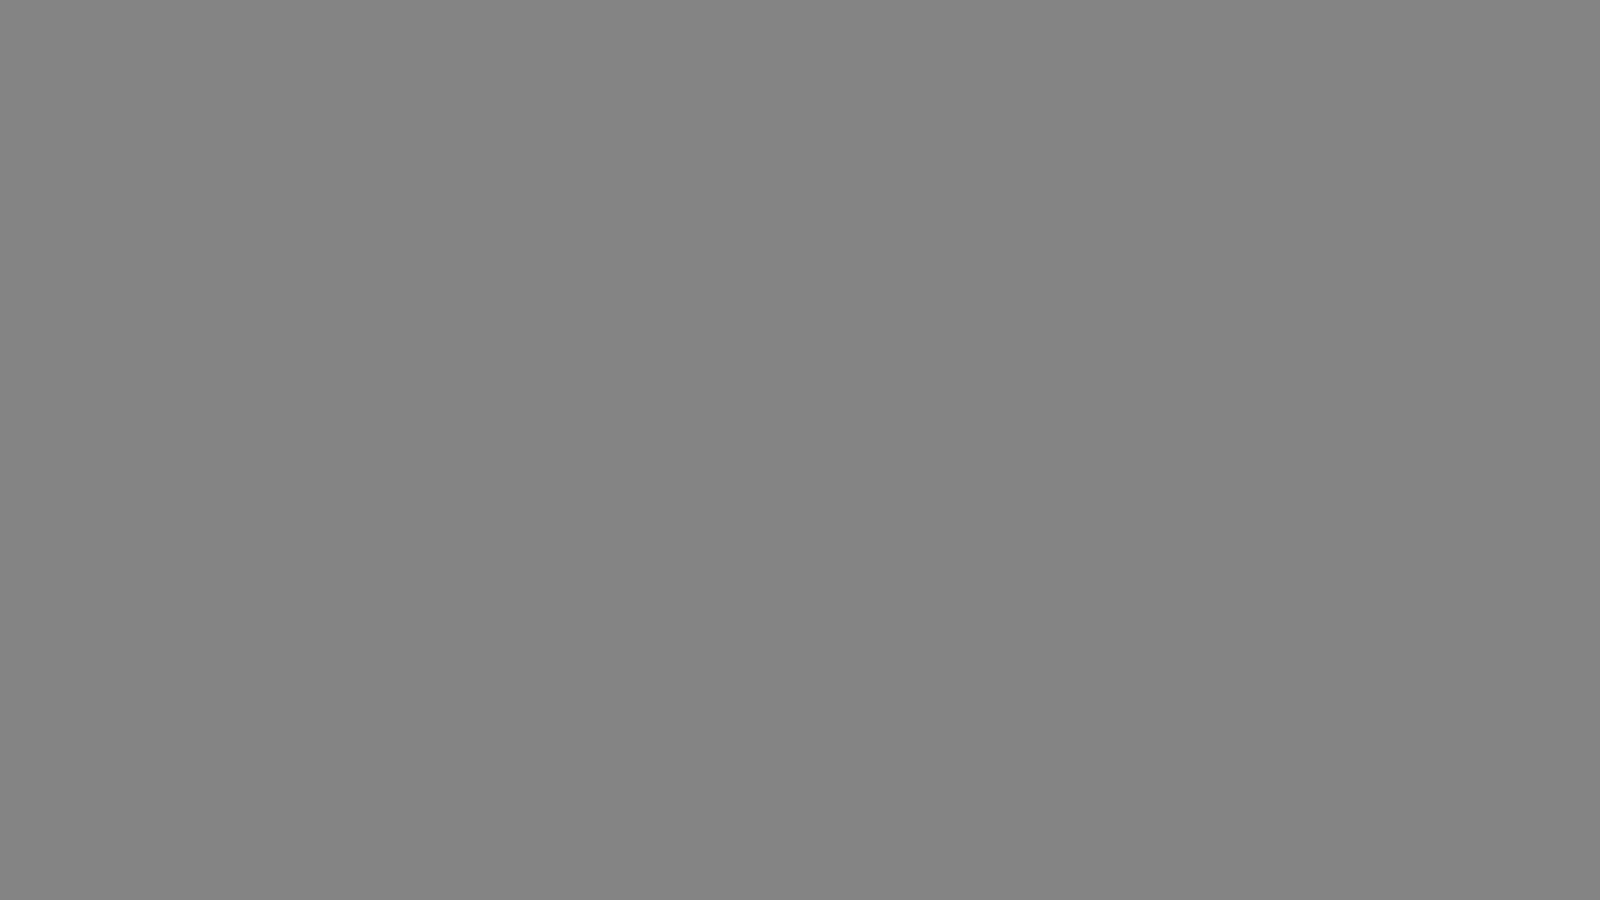 1600x900 Battleship Grey Solid Color Background